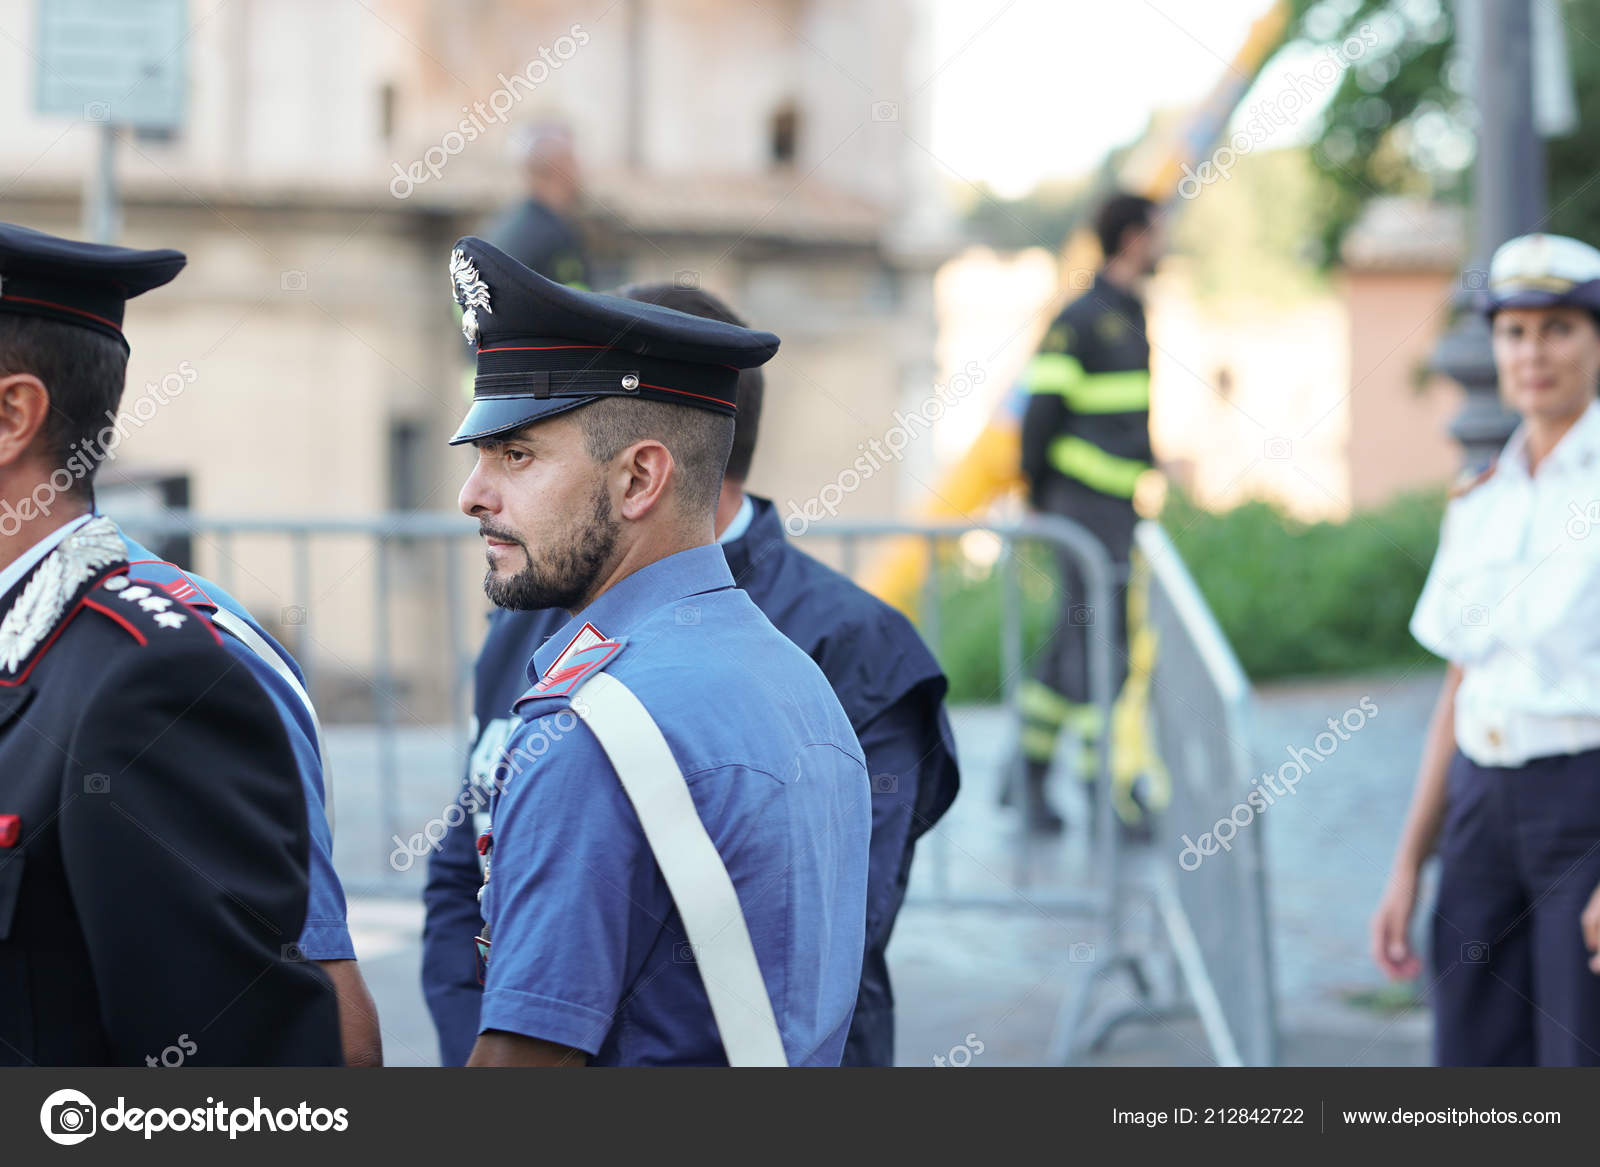 Carabinieri Italian Police Cavalry   Italian Carabinieri